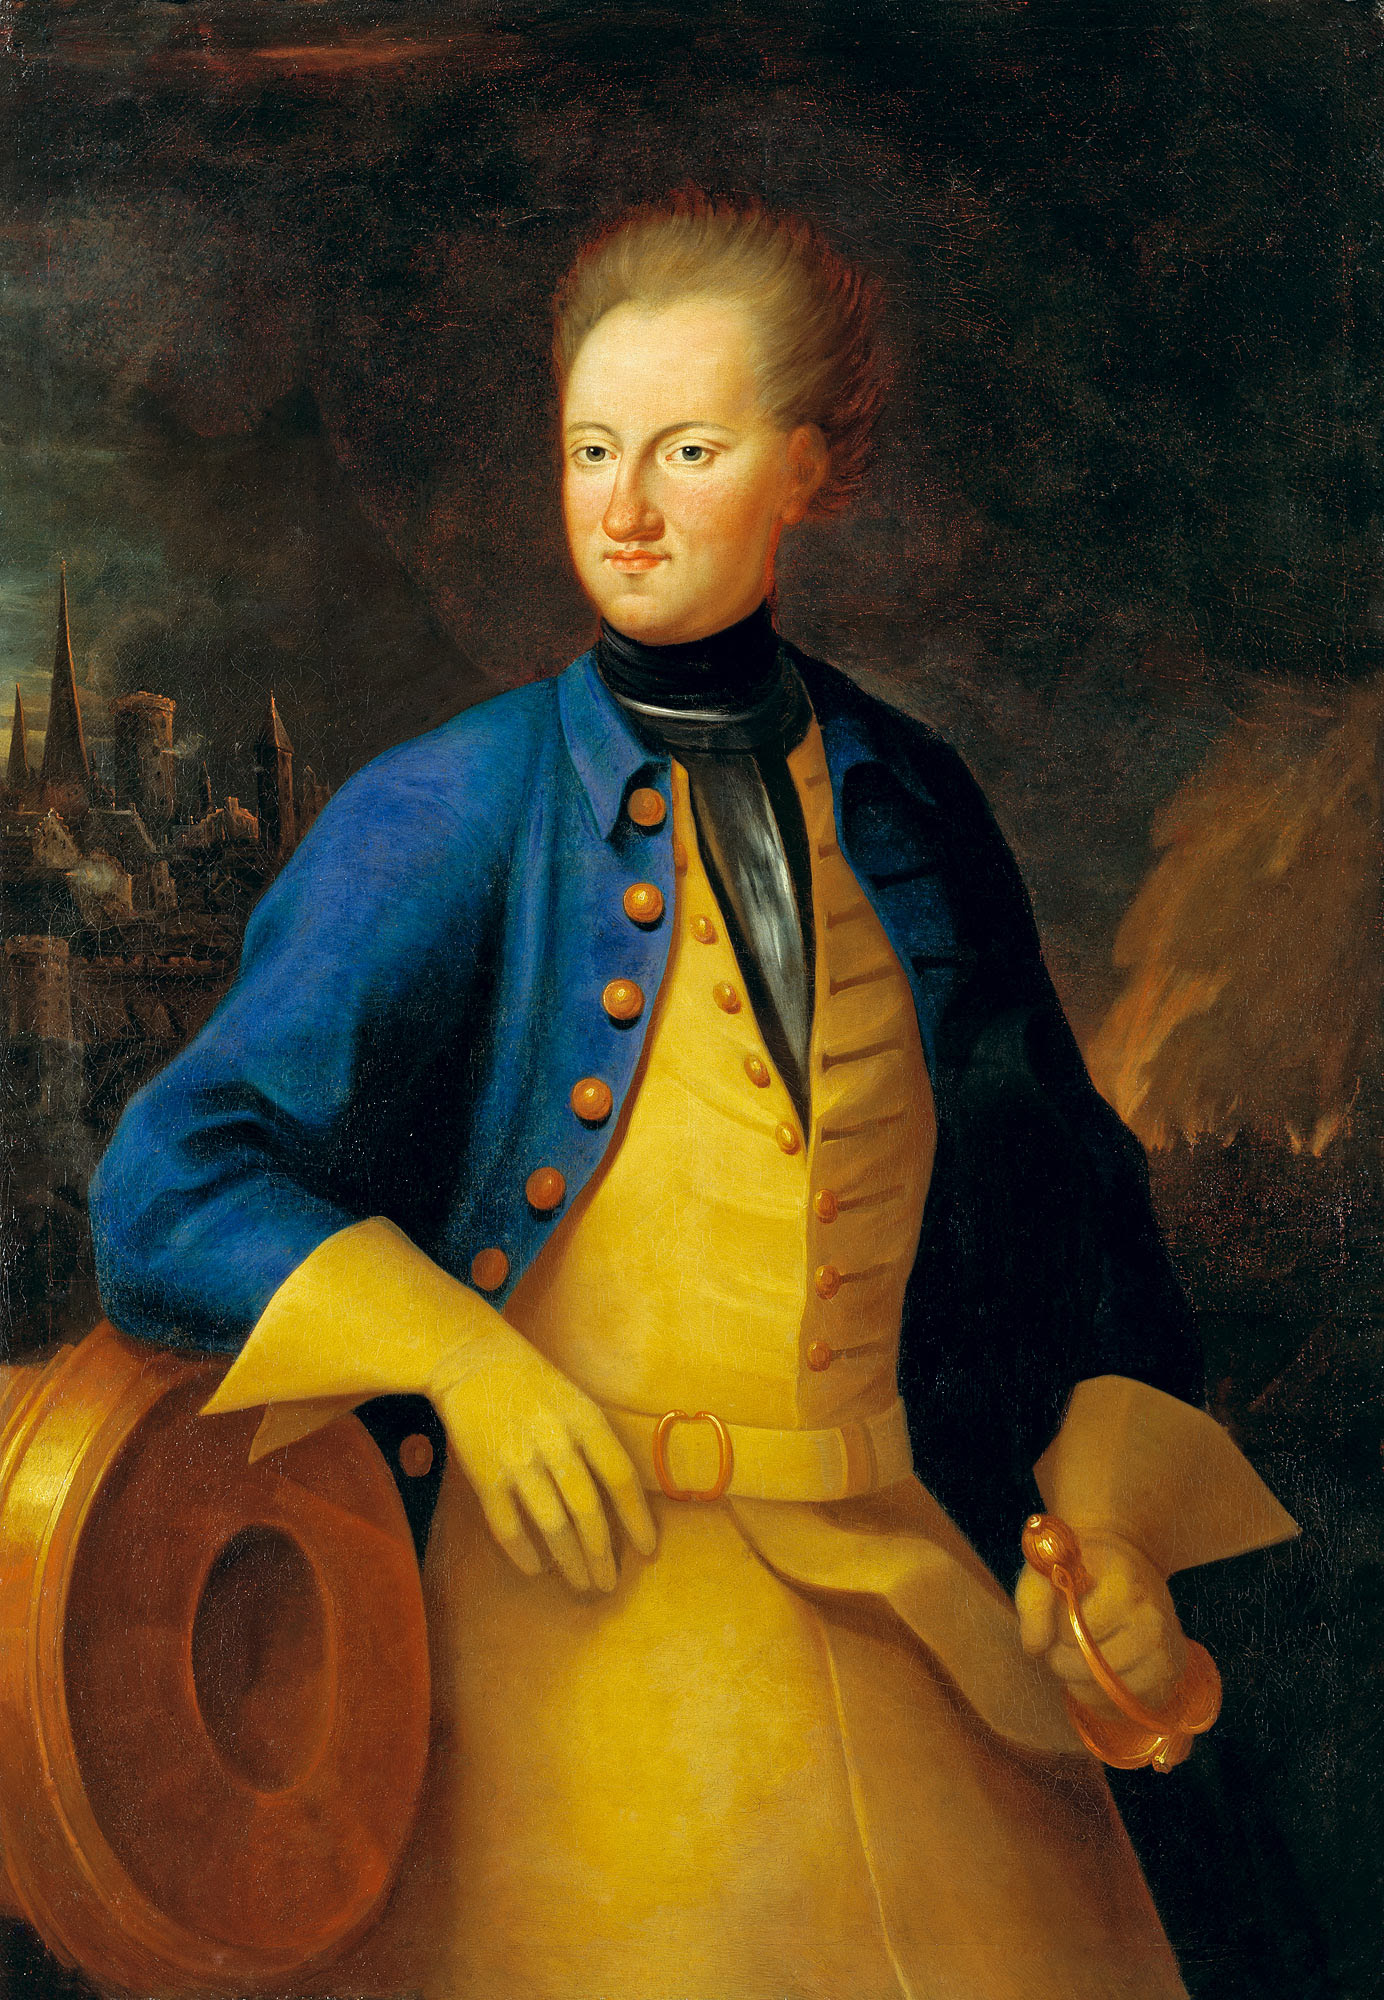 File:Axel Sparre - Karl den XII, 1682-1718, kung av Sverige.jpg